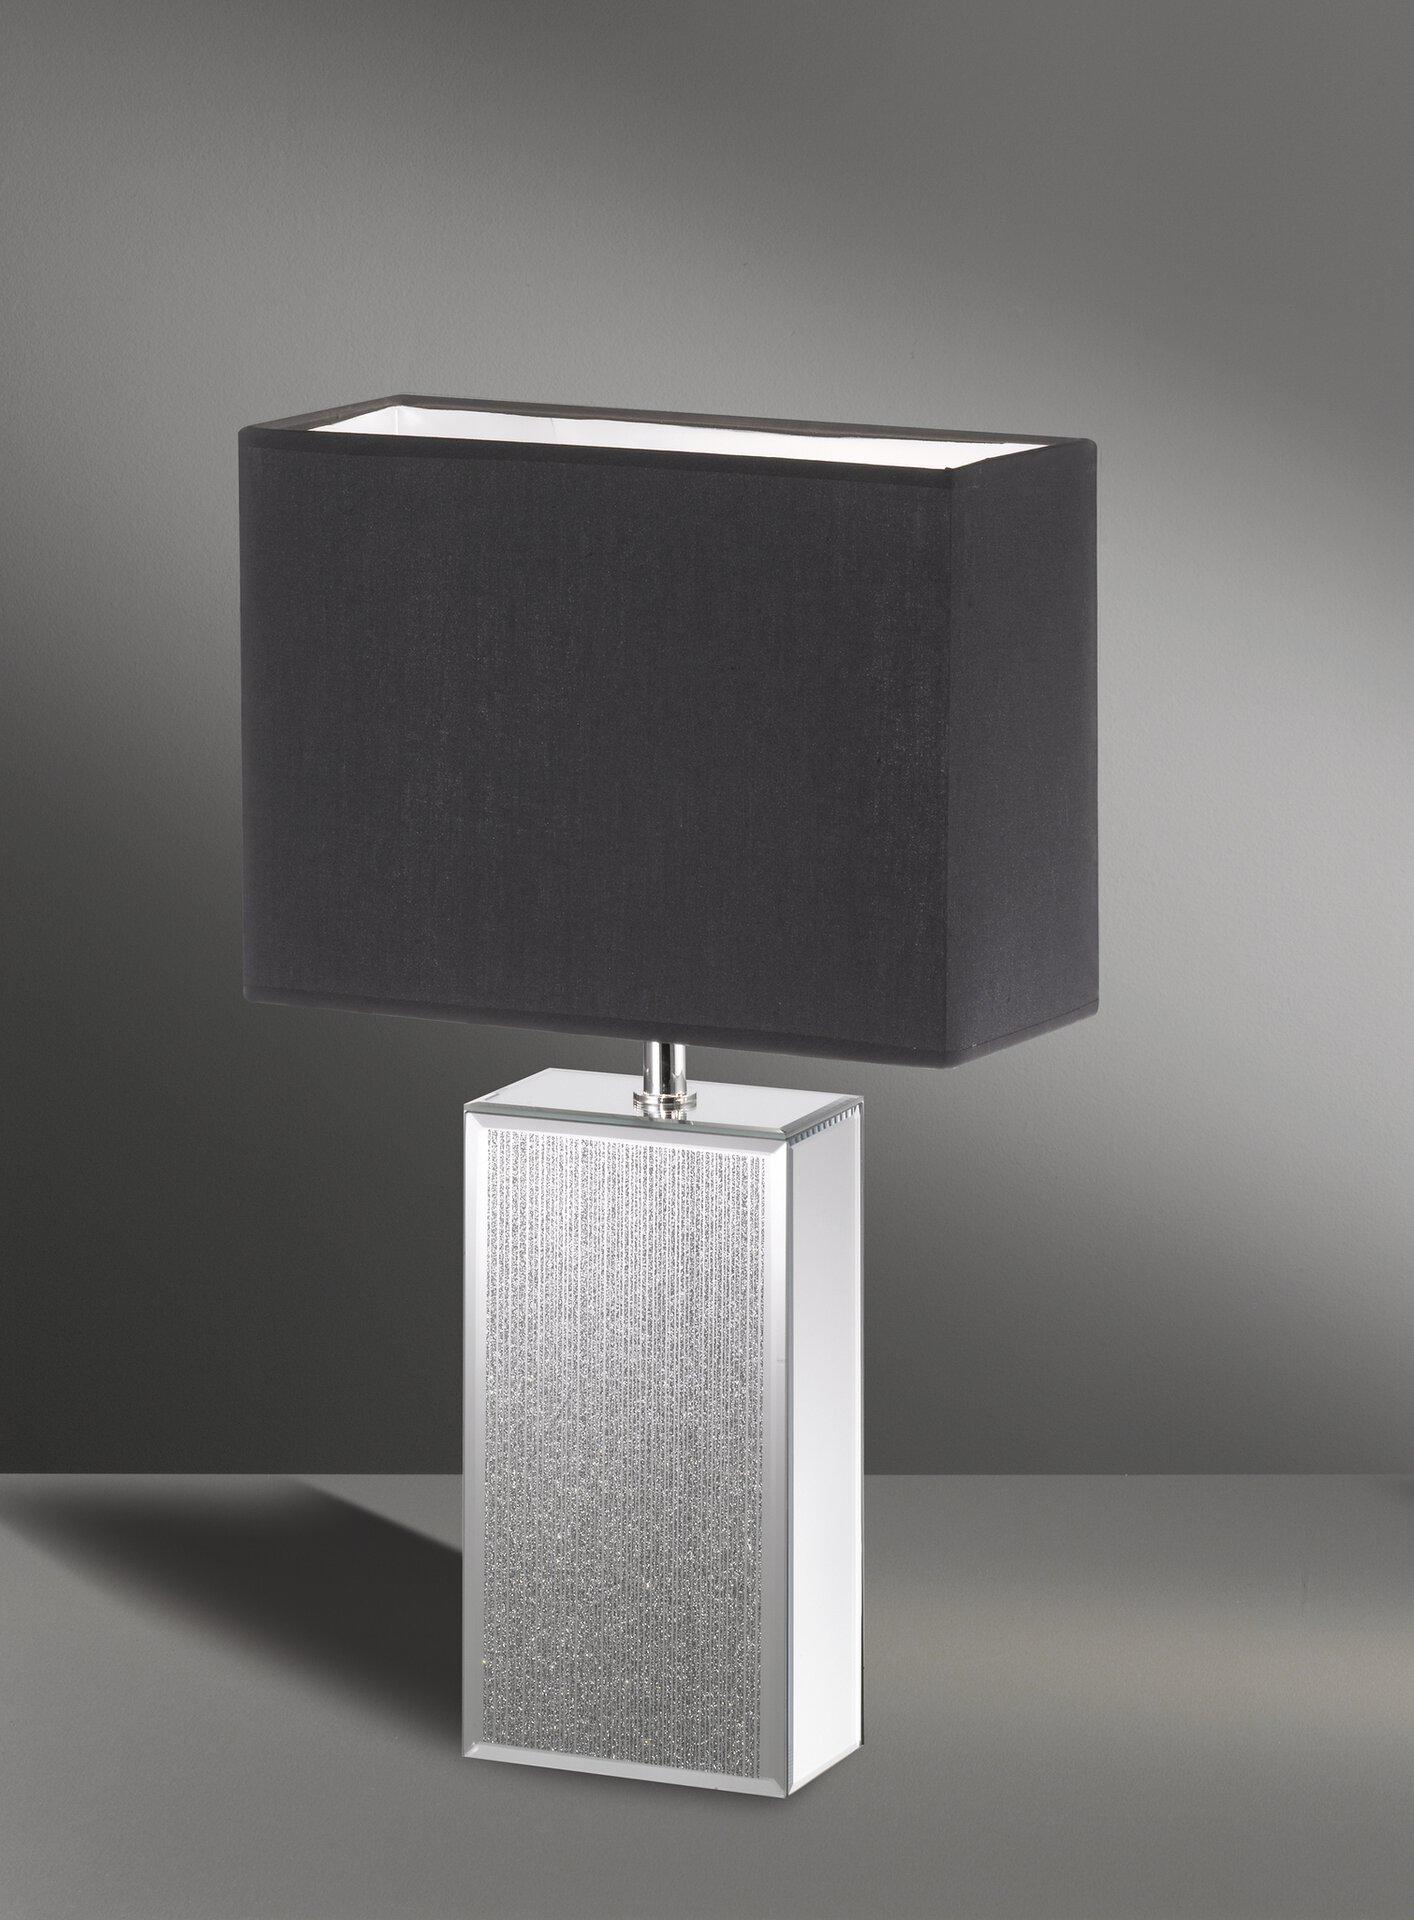 Tischleuchte Bert Fischer-Honsel Metall grau 22 x 50 x 30 cm